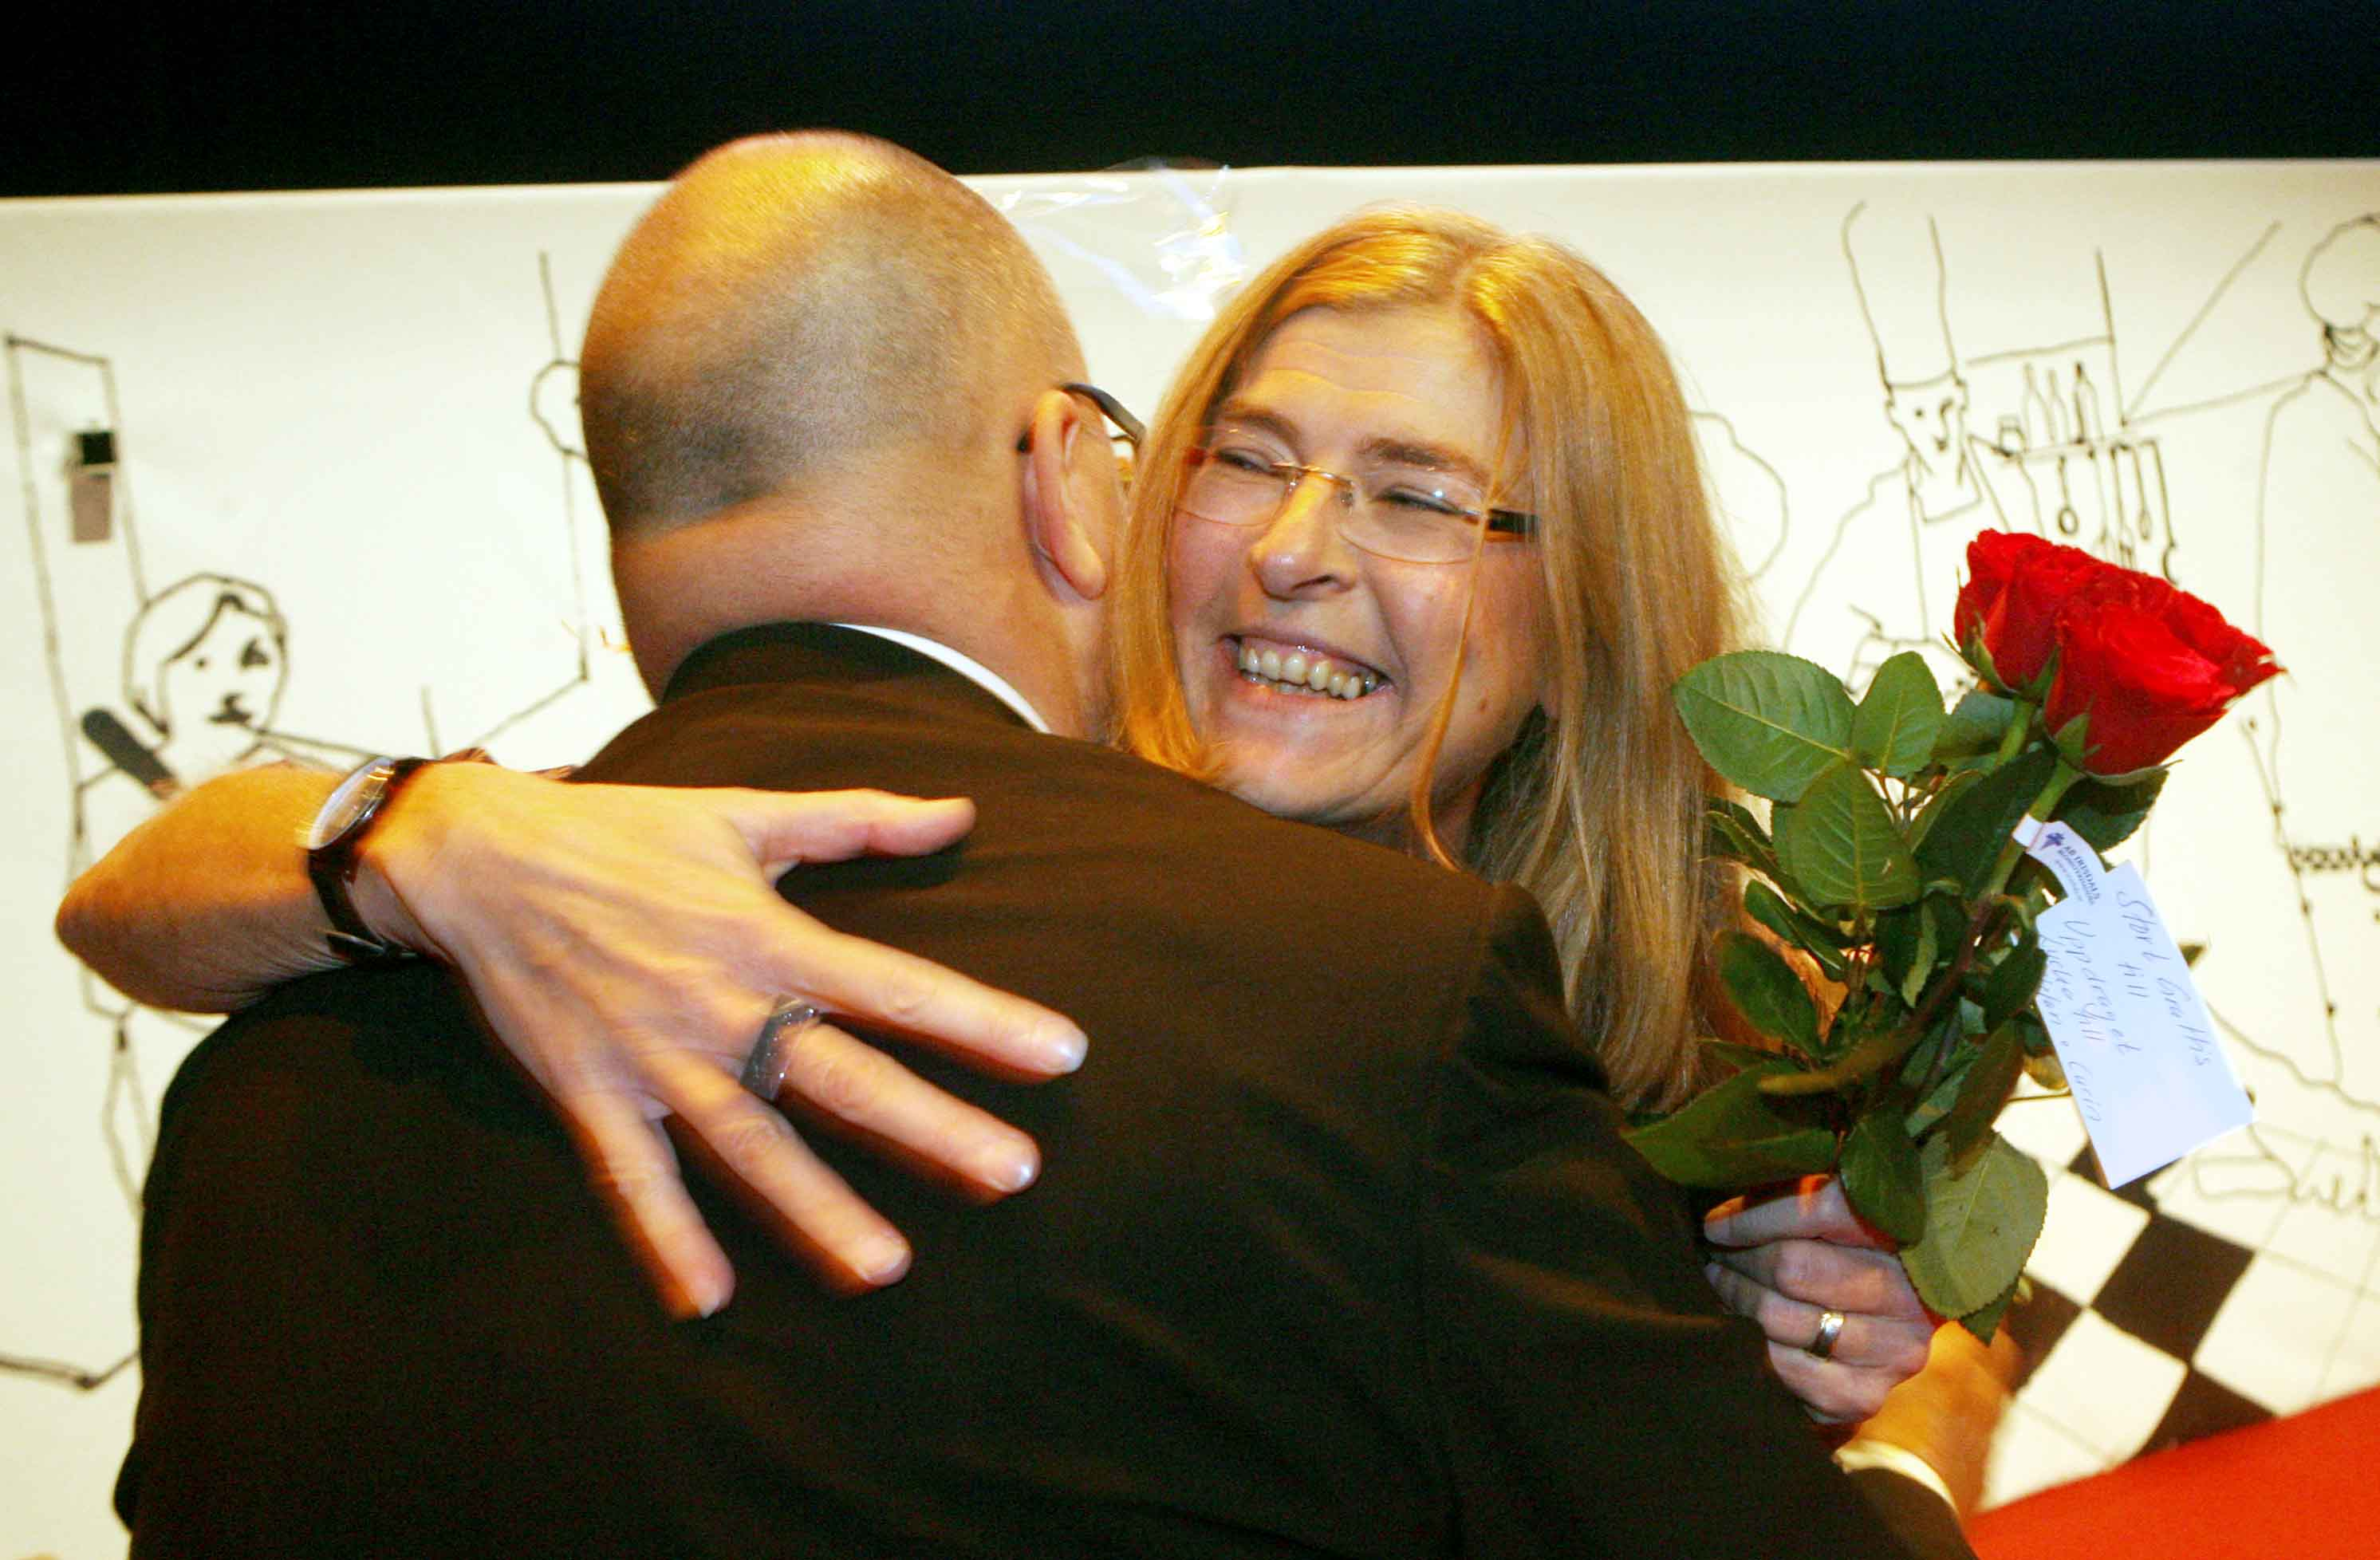 Therese Gouvelin gratuleras av LO-ordföranden Karl-Petter Thorwaldsson. Foto: Tobias Wallström